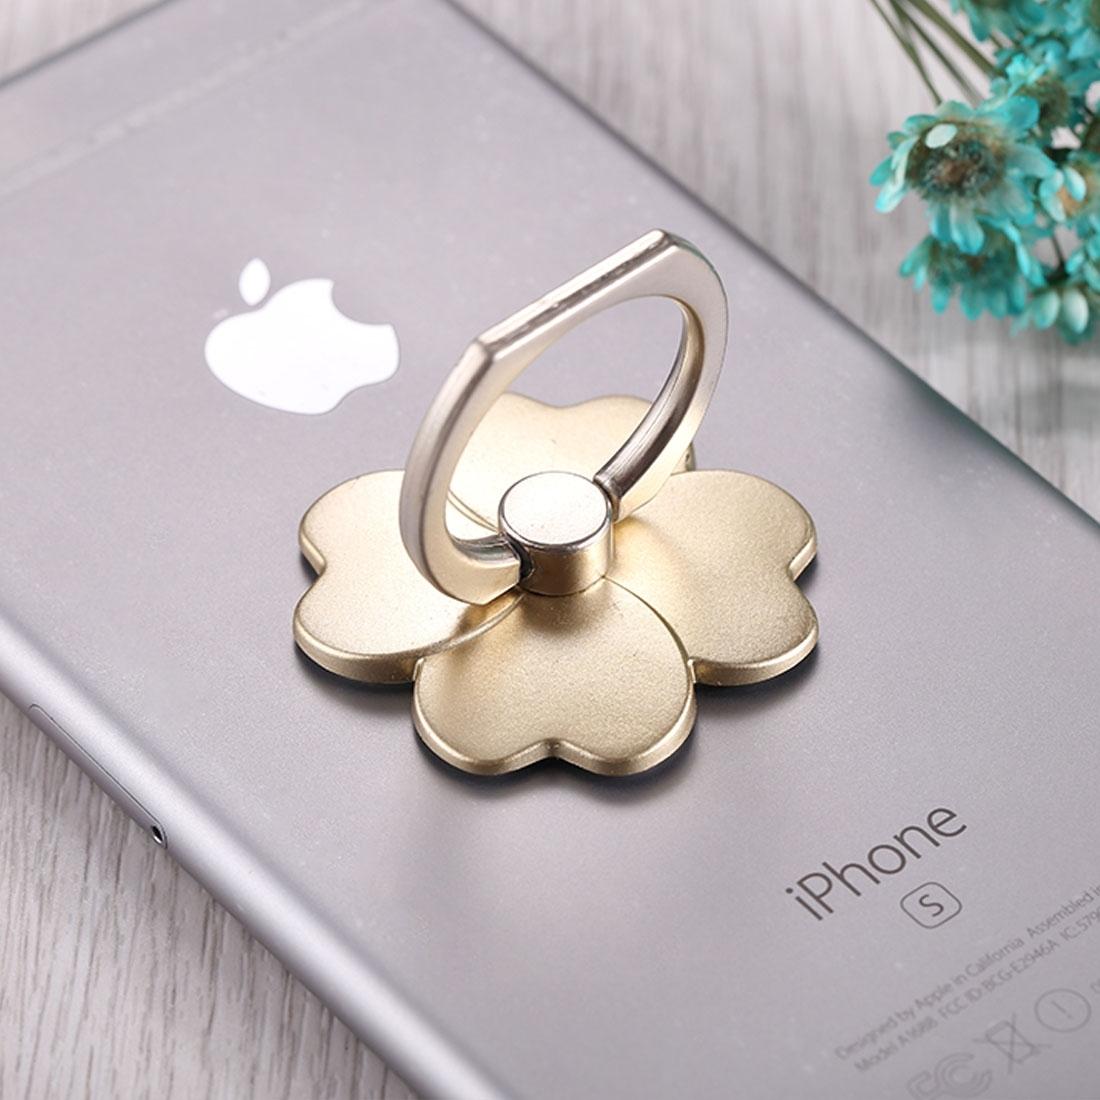 FLOWER Kovový držák / stojan na telefon zlatý